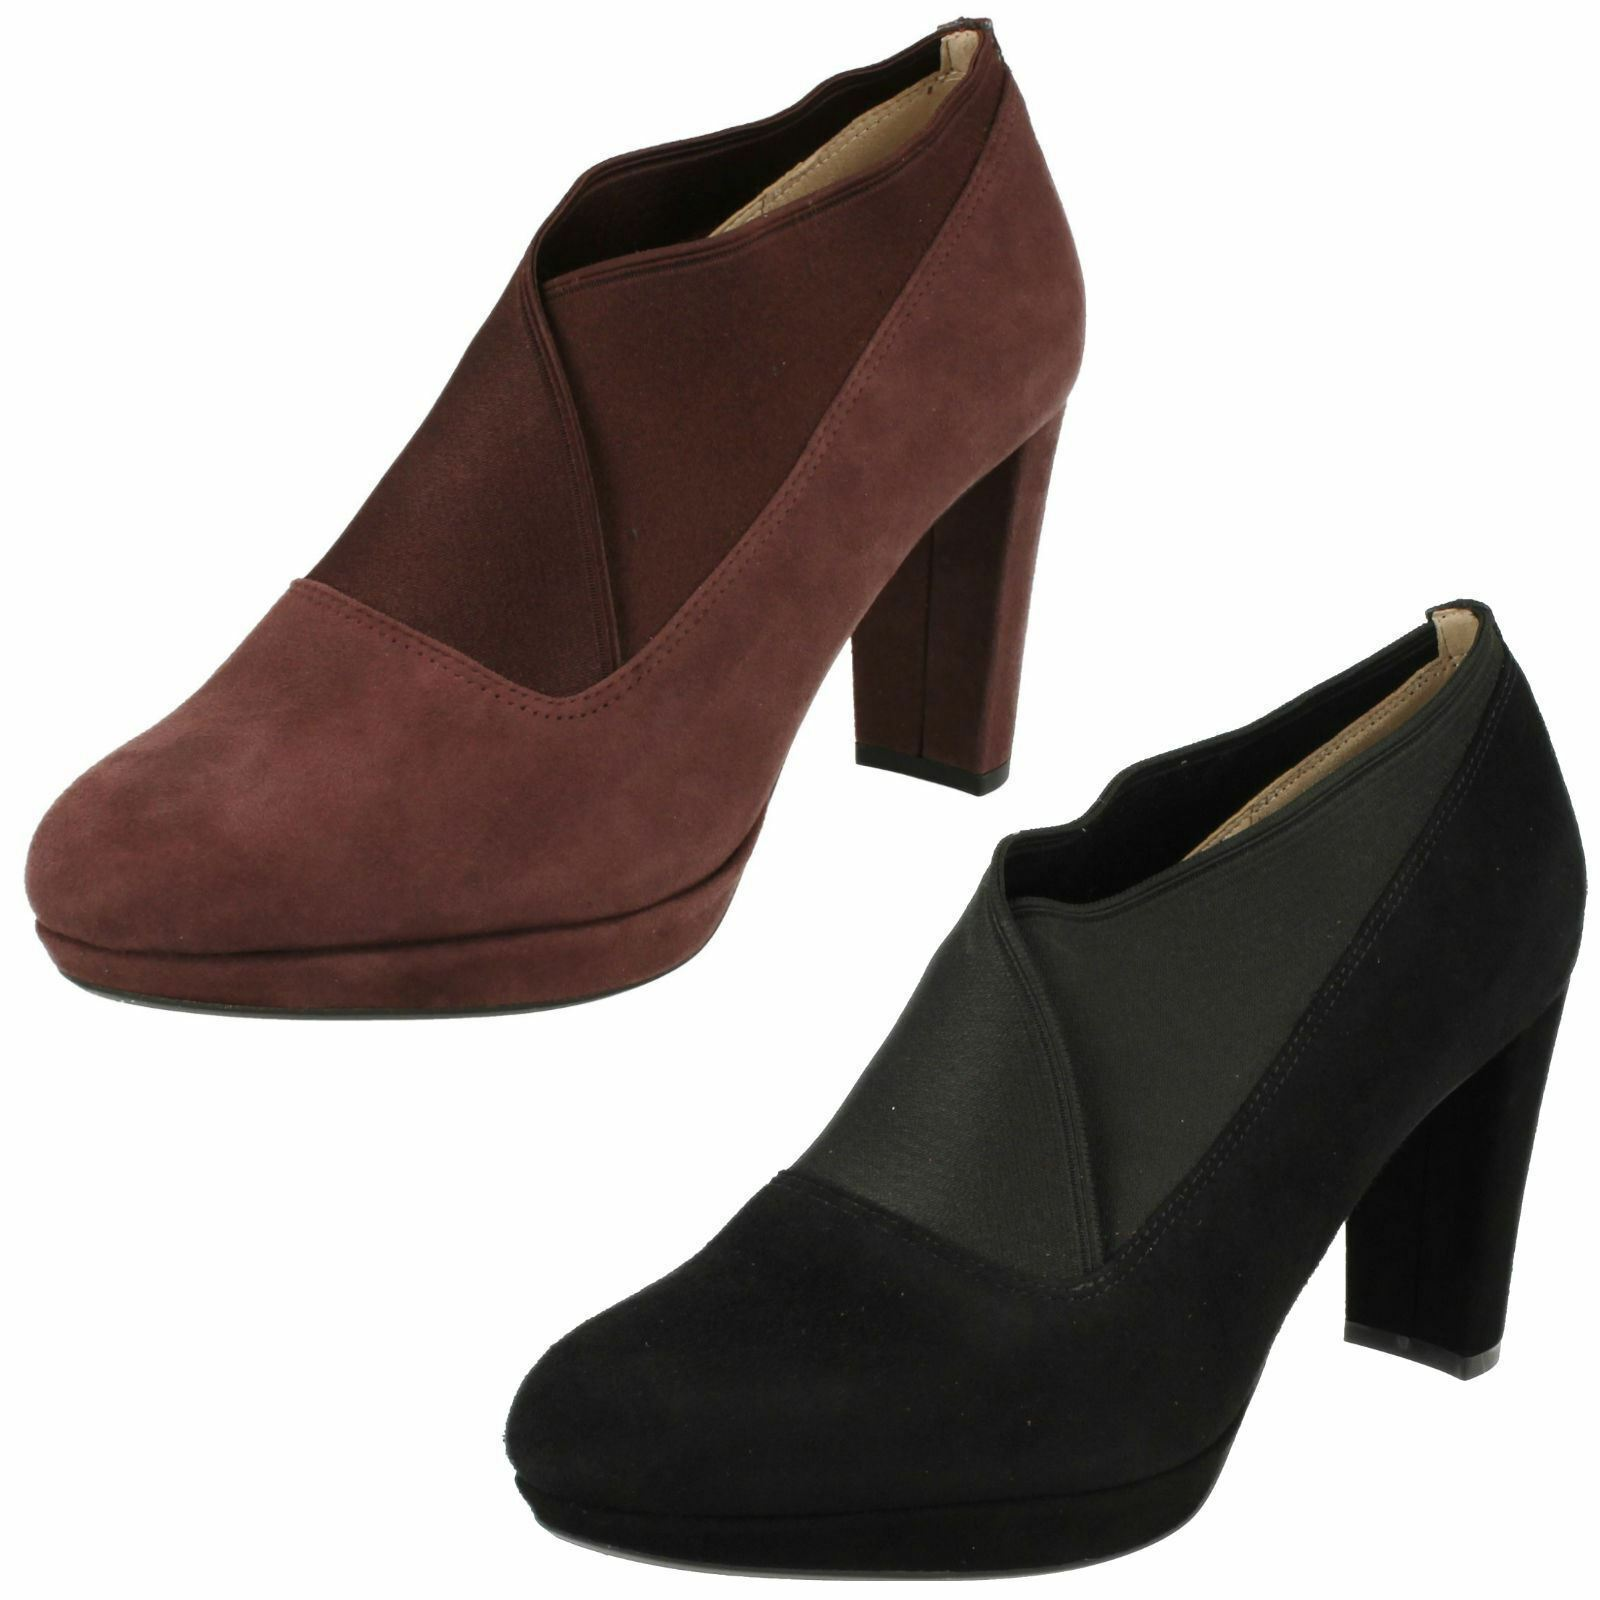 Clarks Damen Wildleder Hose Schuhe 'Kendra Mix'